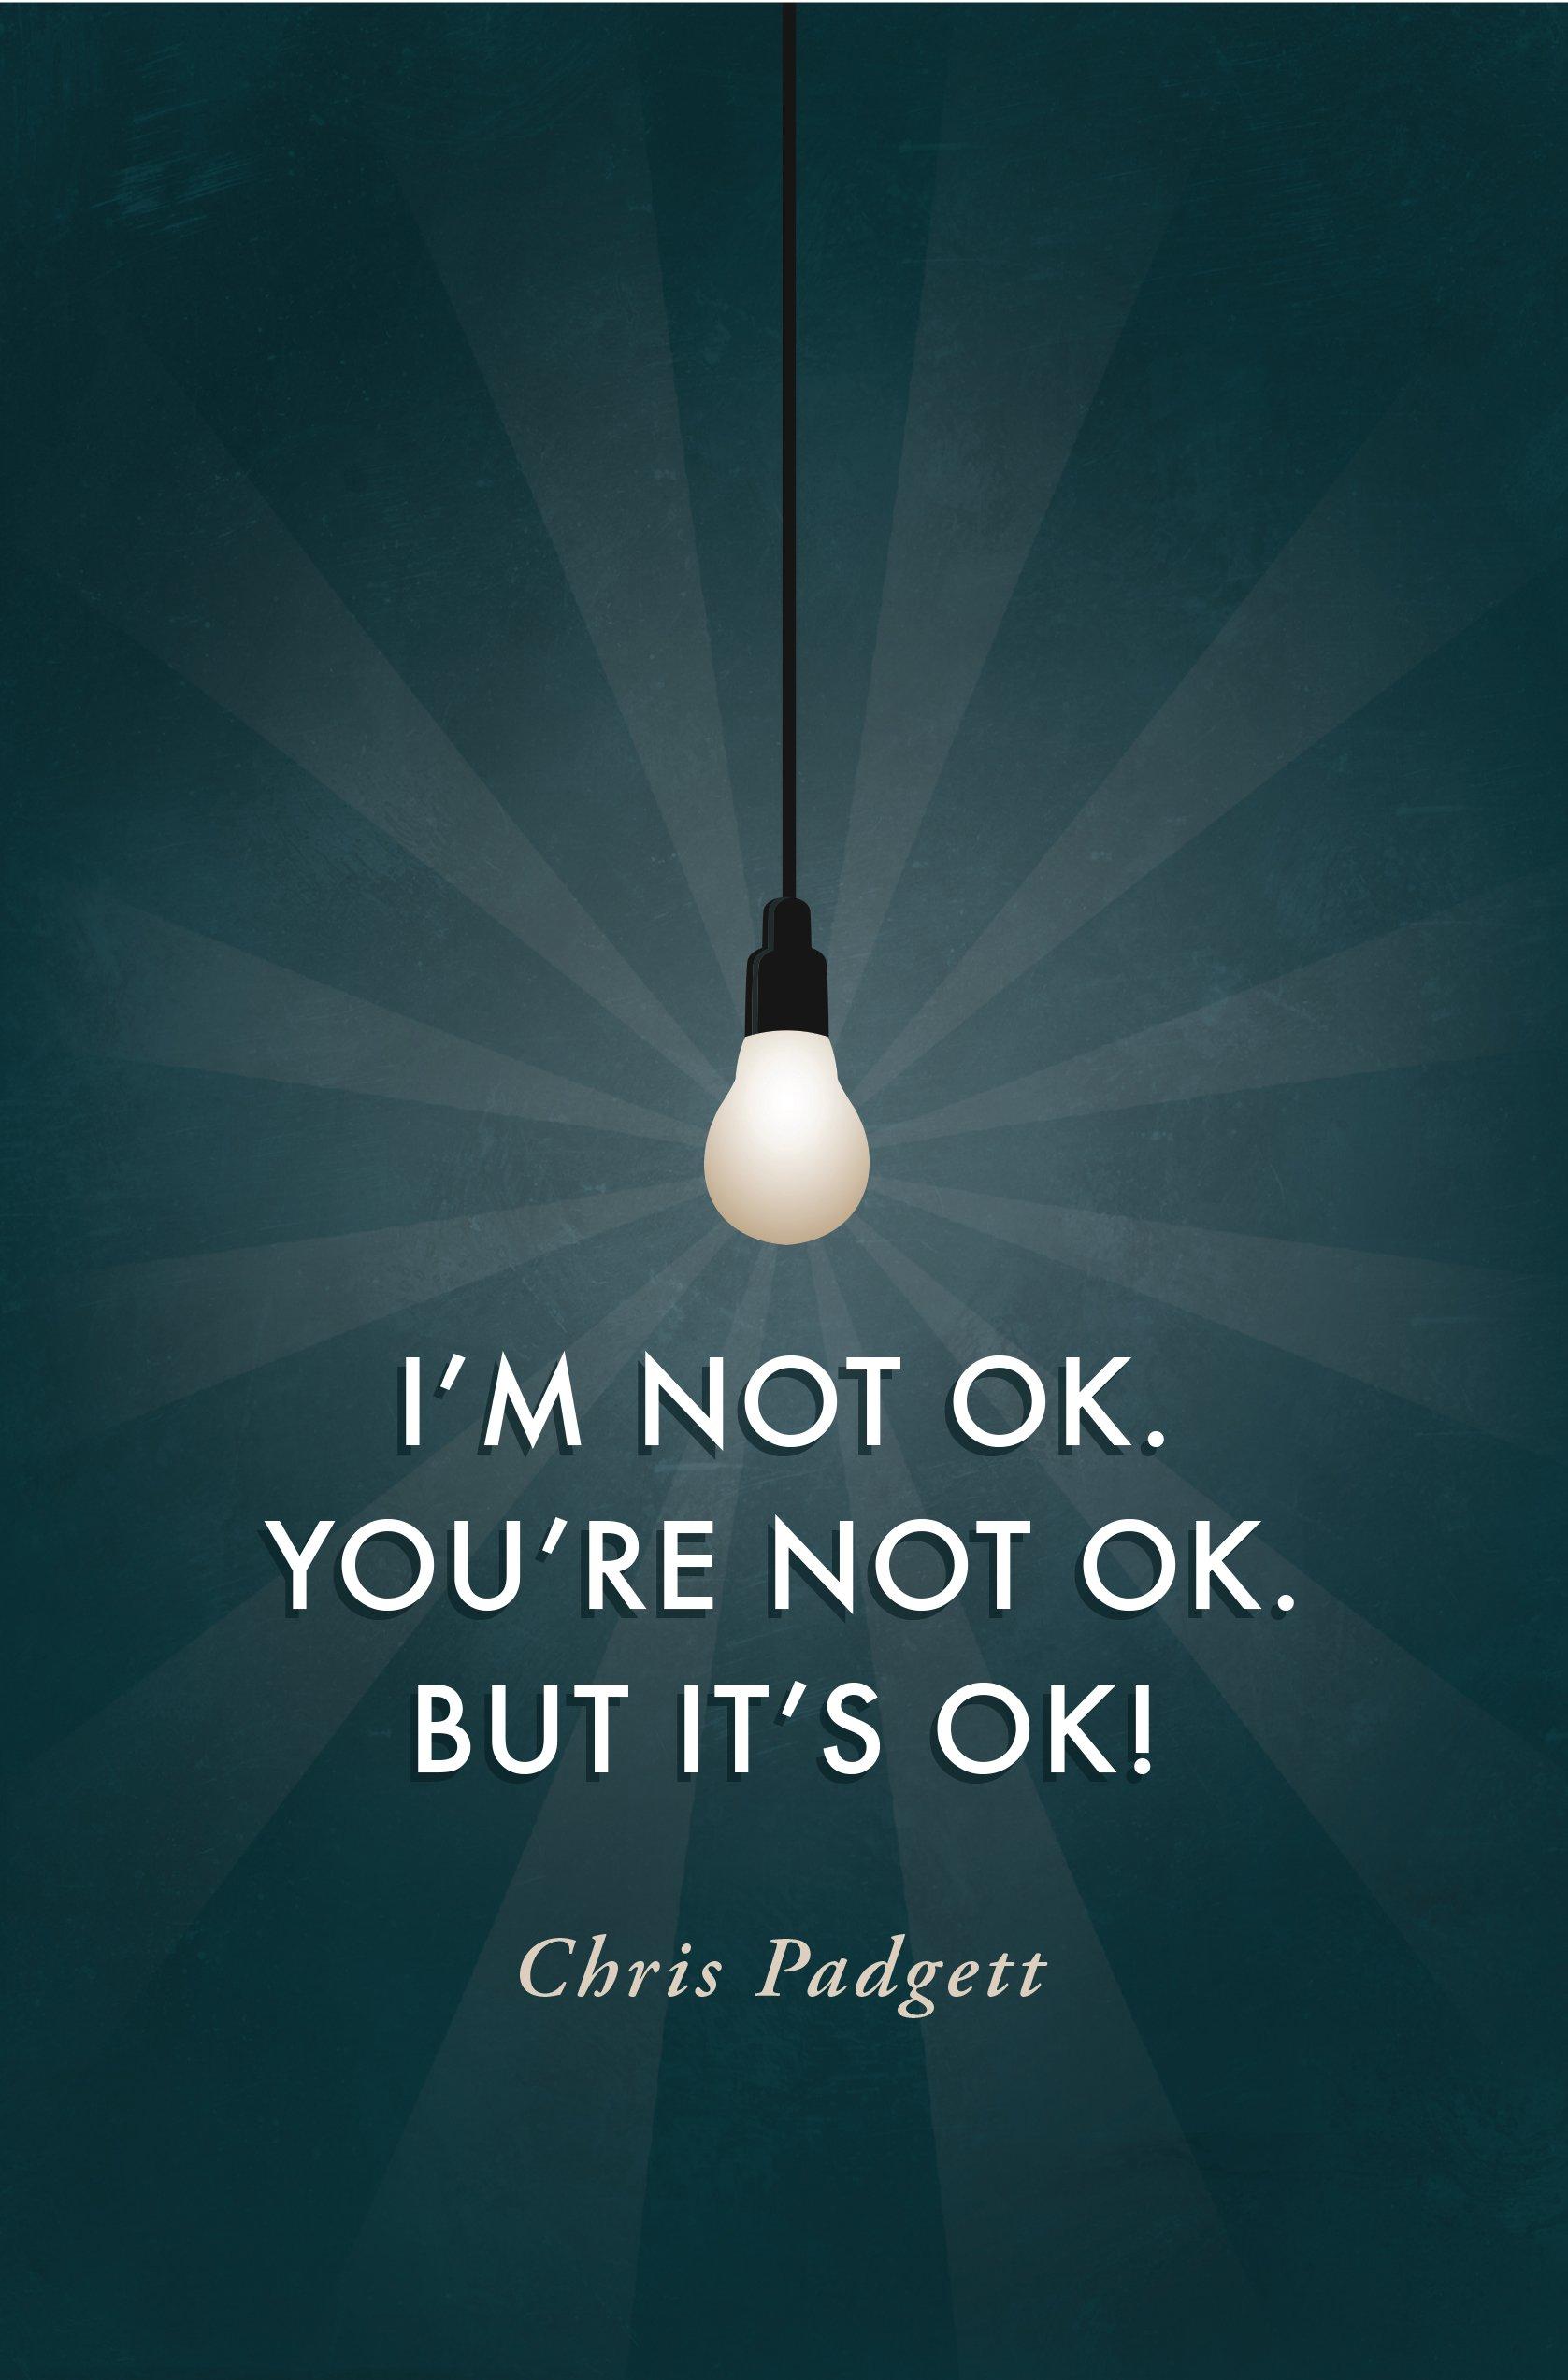 I M Not Ok You Re Not Ok But It S Ok Chris Padgett 9781937509774 Amazon Com Books